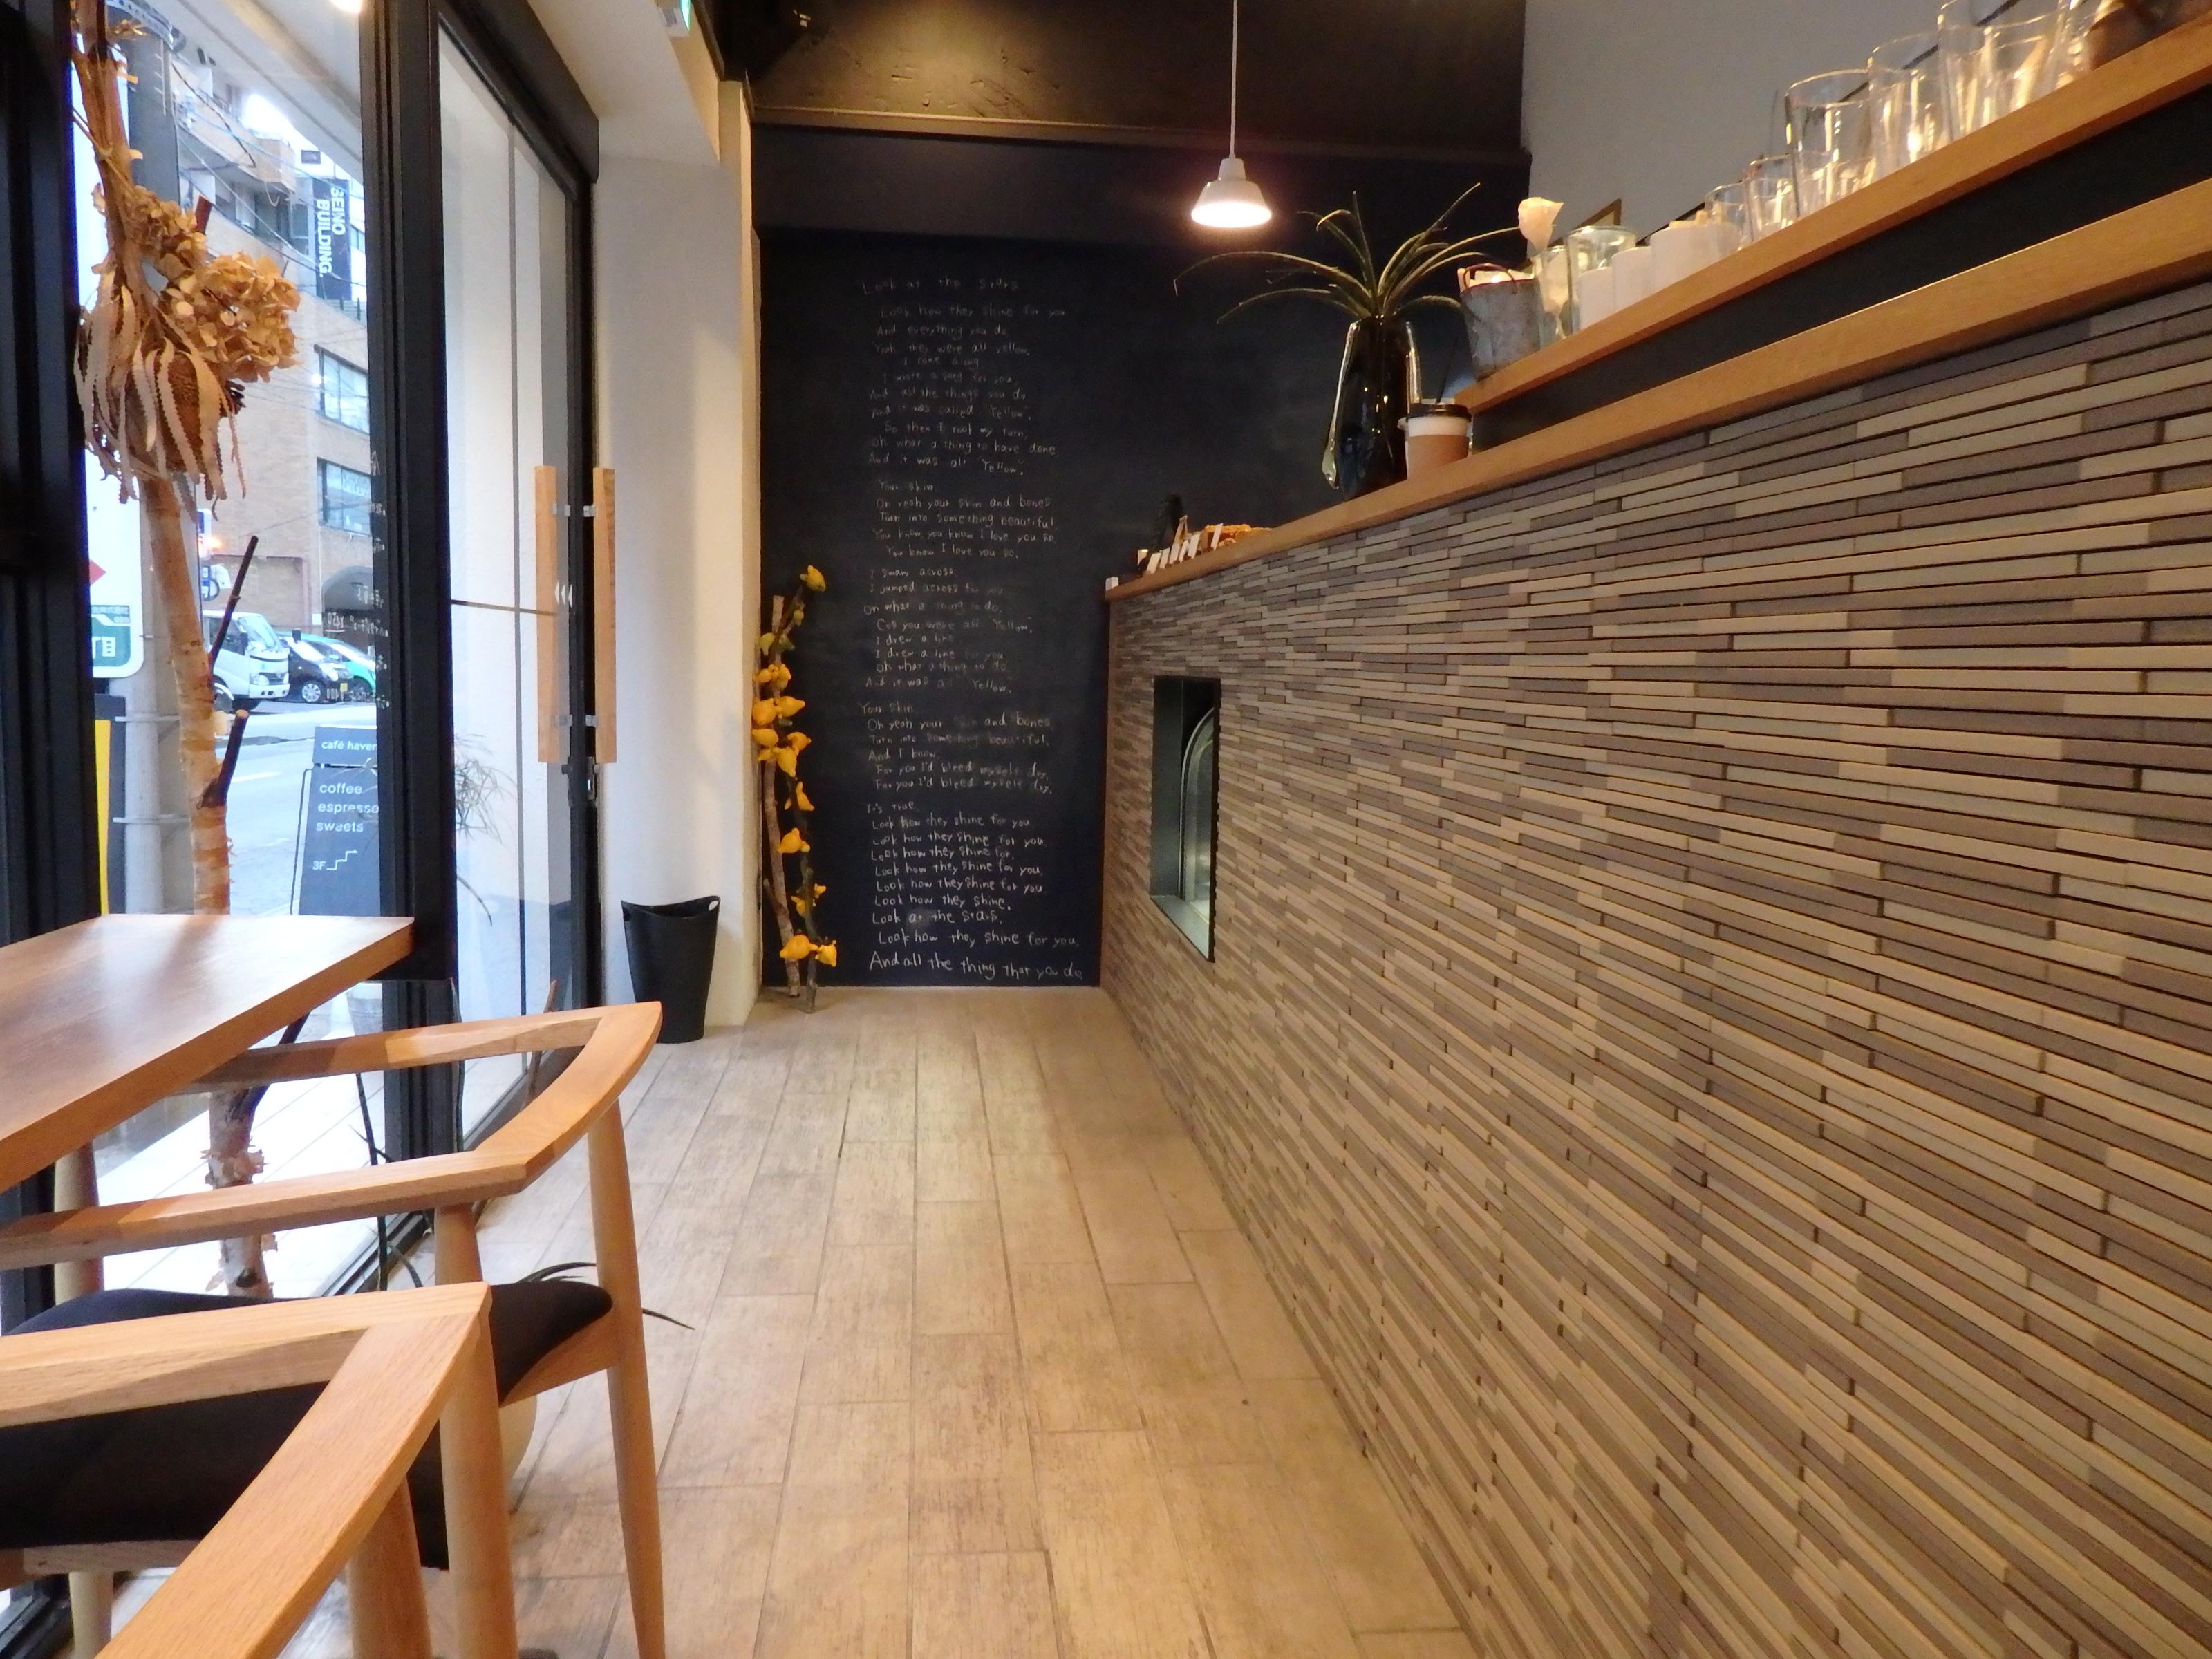 【Cafe*Vol.6】窓際でくつろぐ焼き菓子の美味しいカフェ